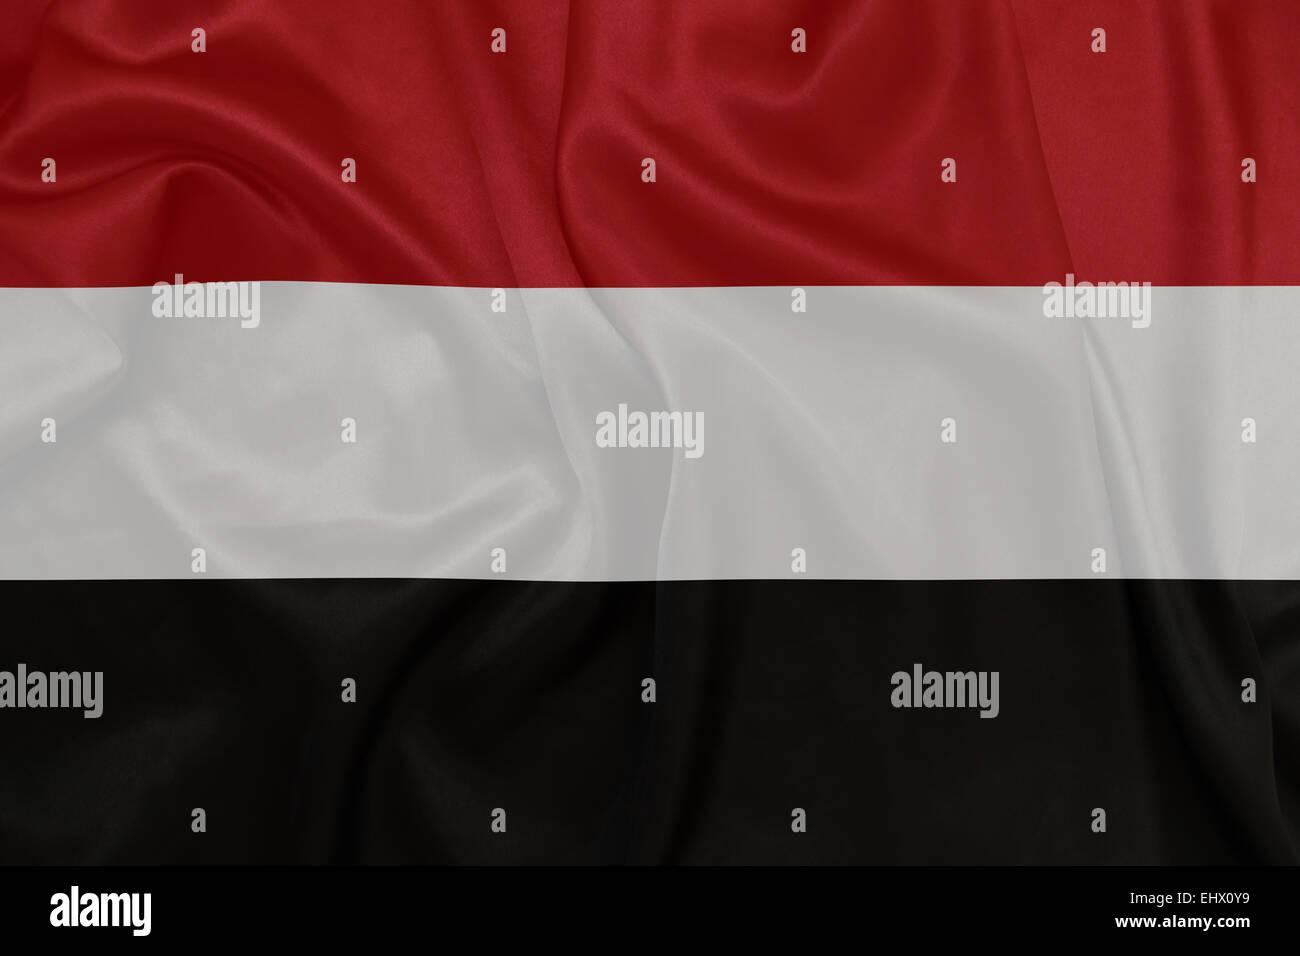 Yemen - Waving national flag on silk texture - Stock Image